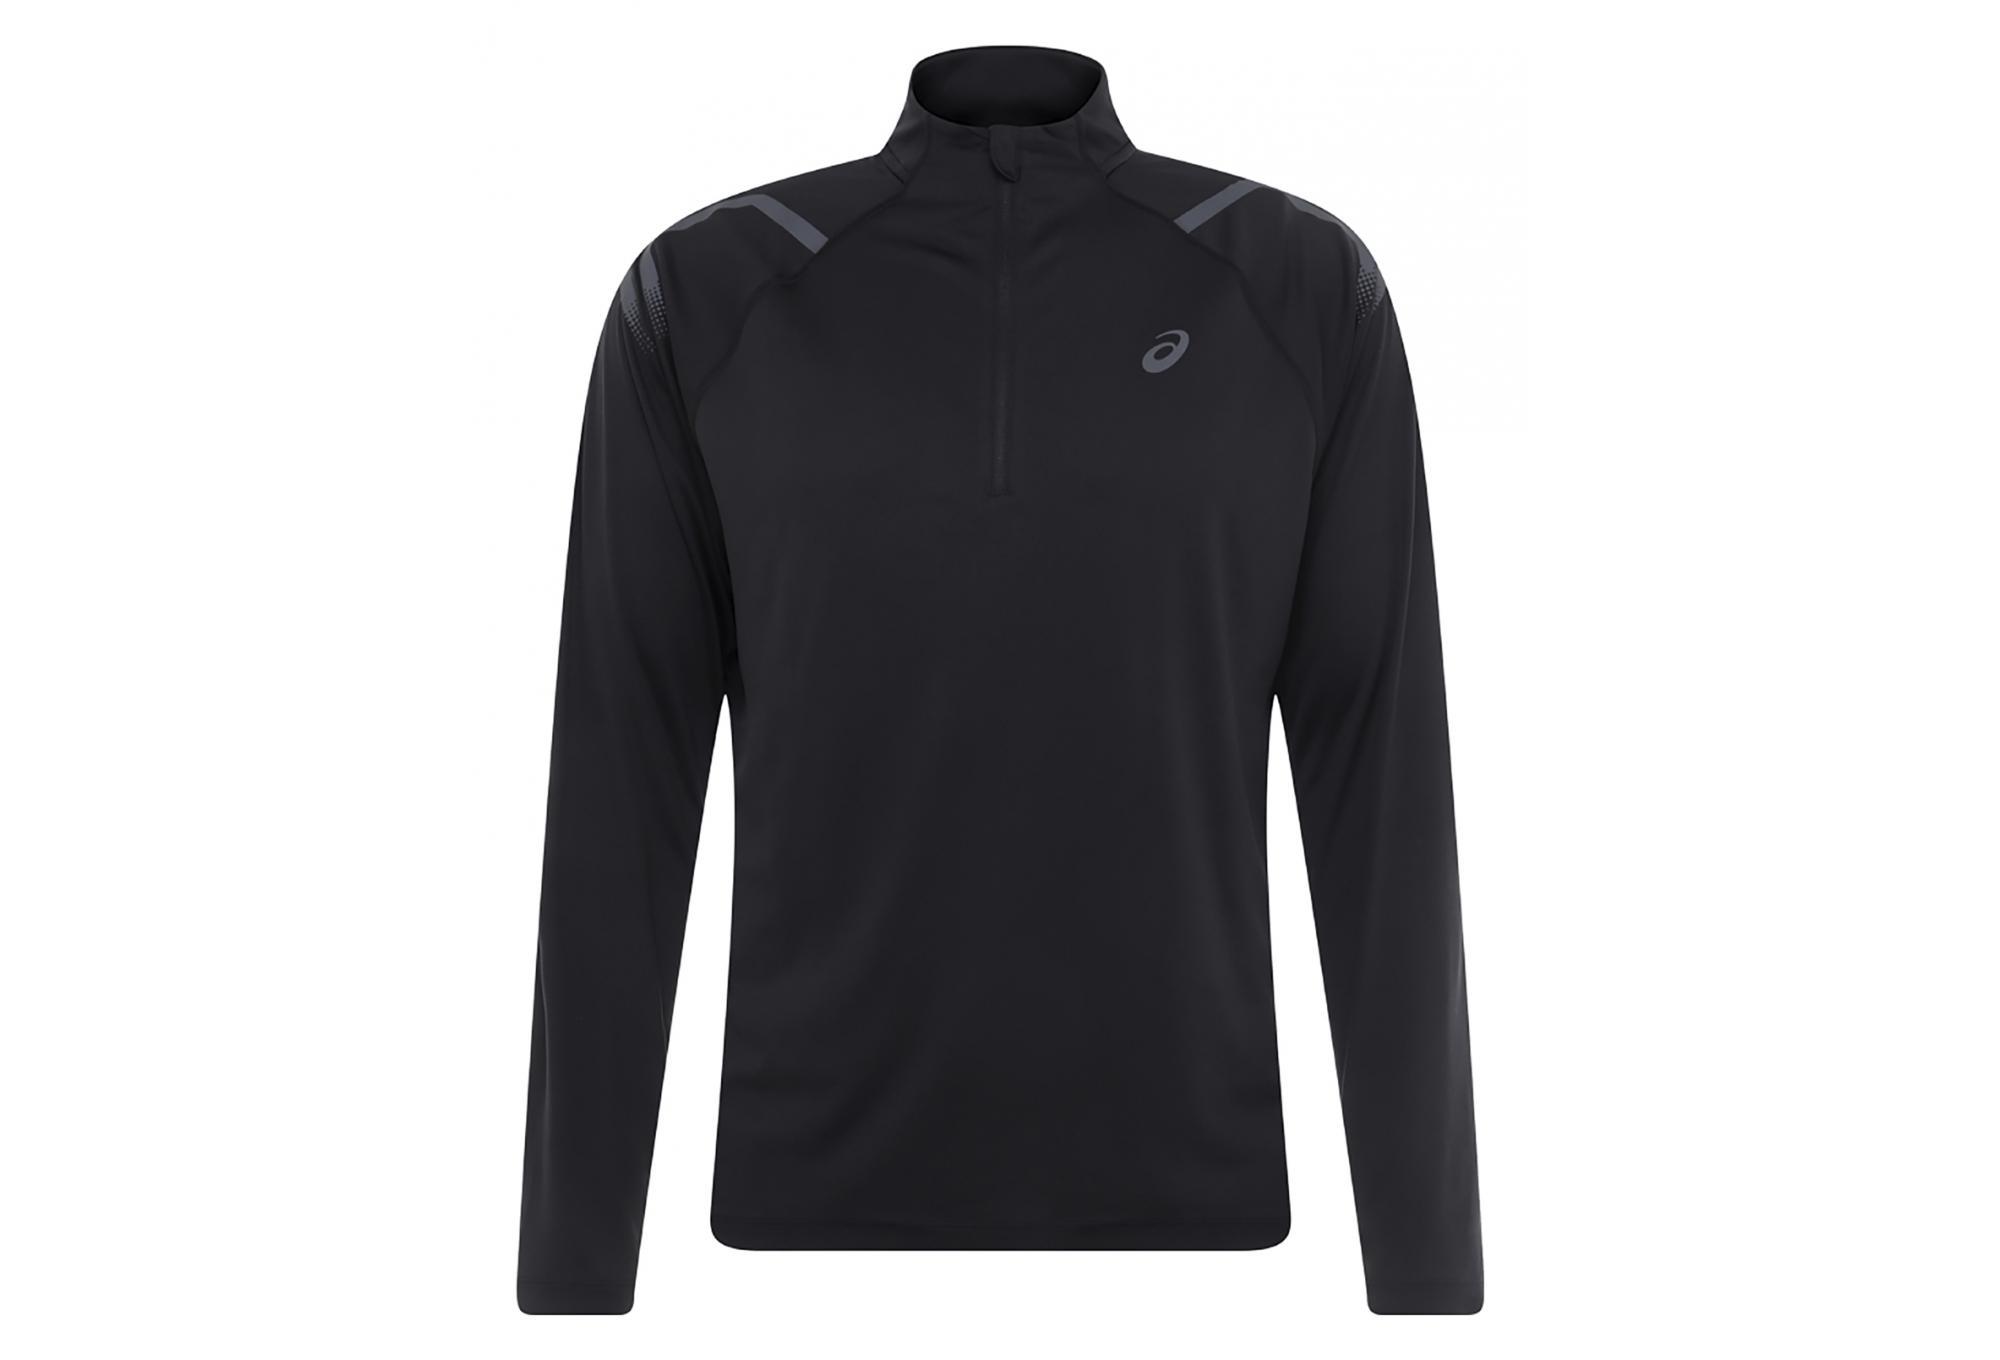 36ed02fac2 Asics Long Sleeves Jersey 1/2 zip Icon Black